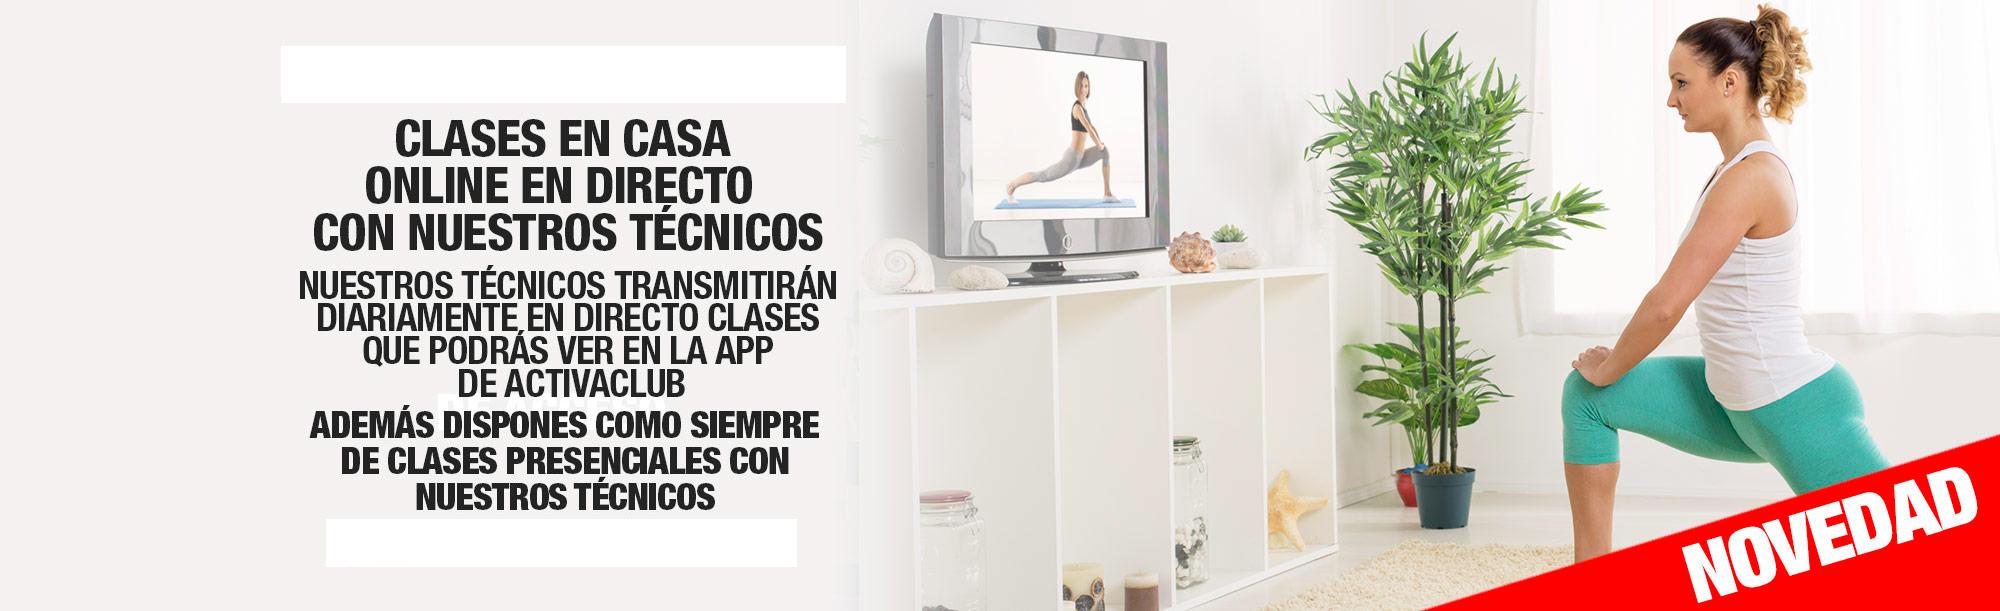 banner_clases_online_directos